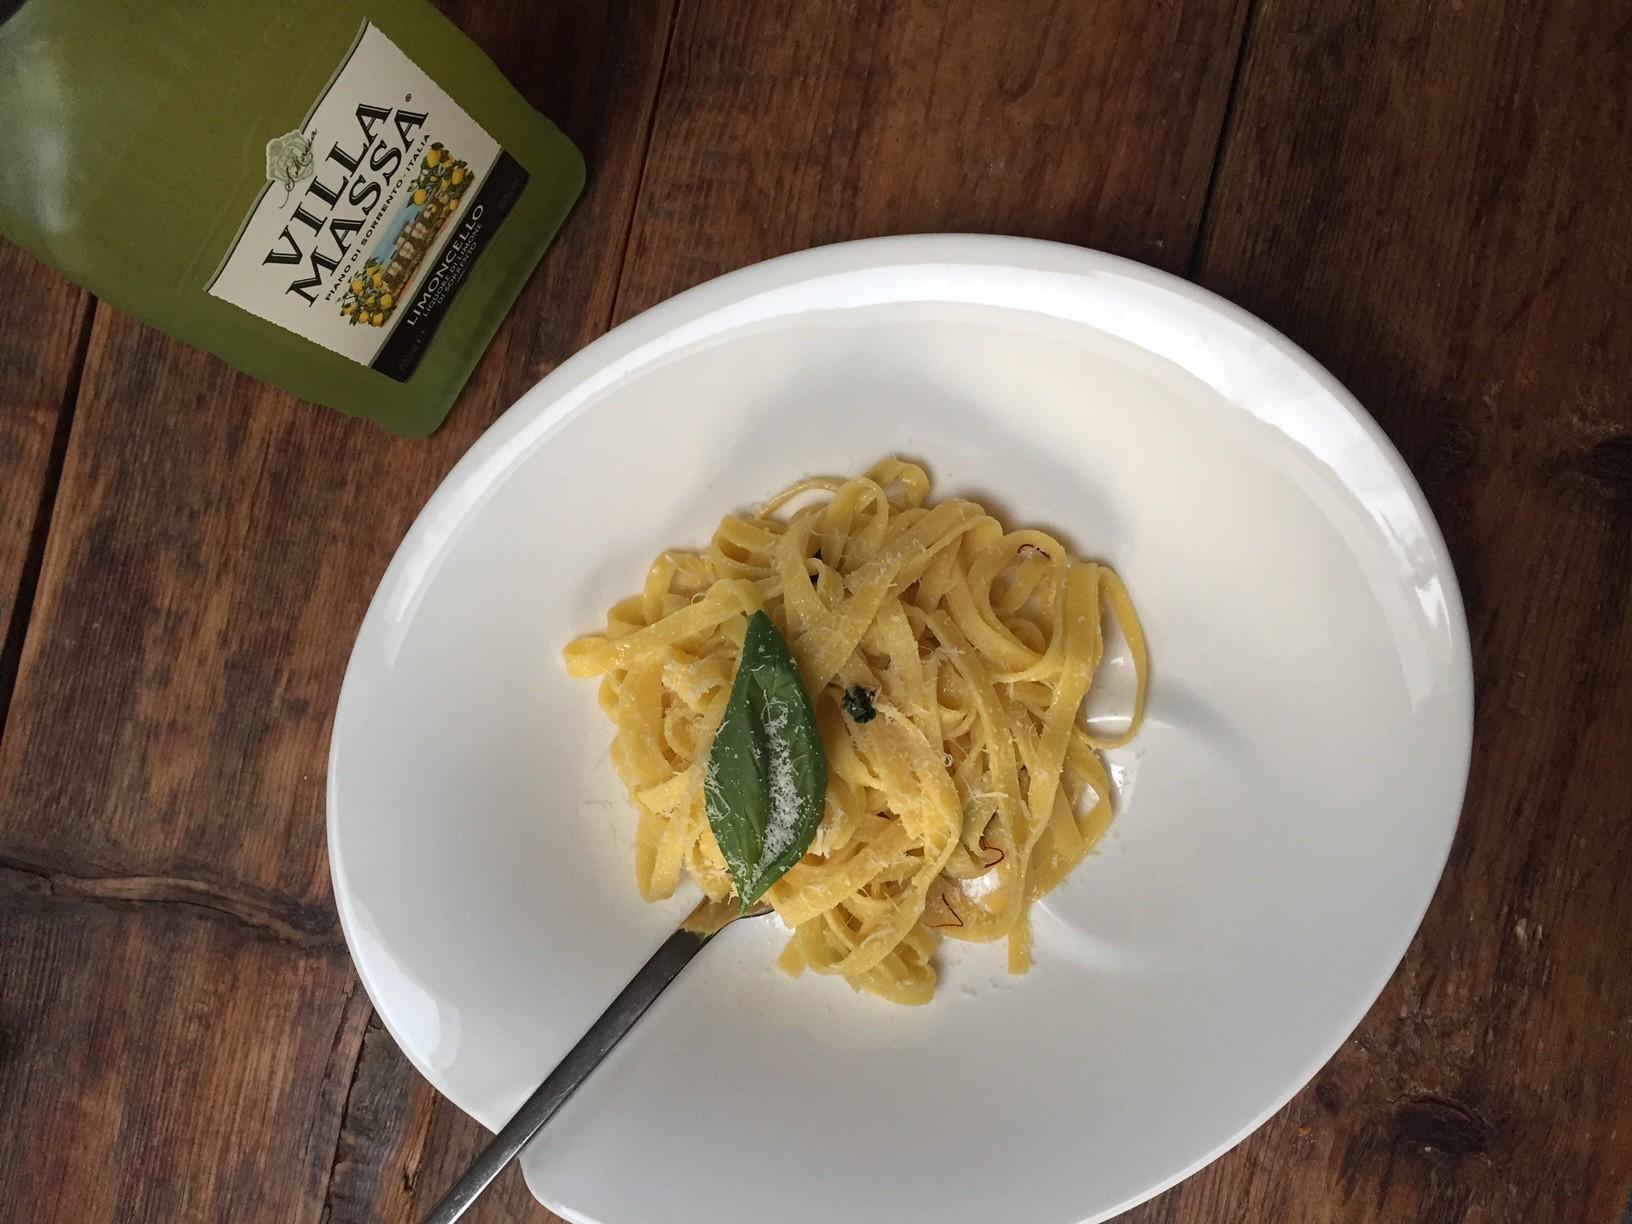 Pasta met saffraan en limoncello recept van foodblog Foodinista